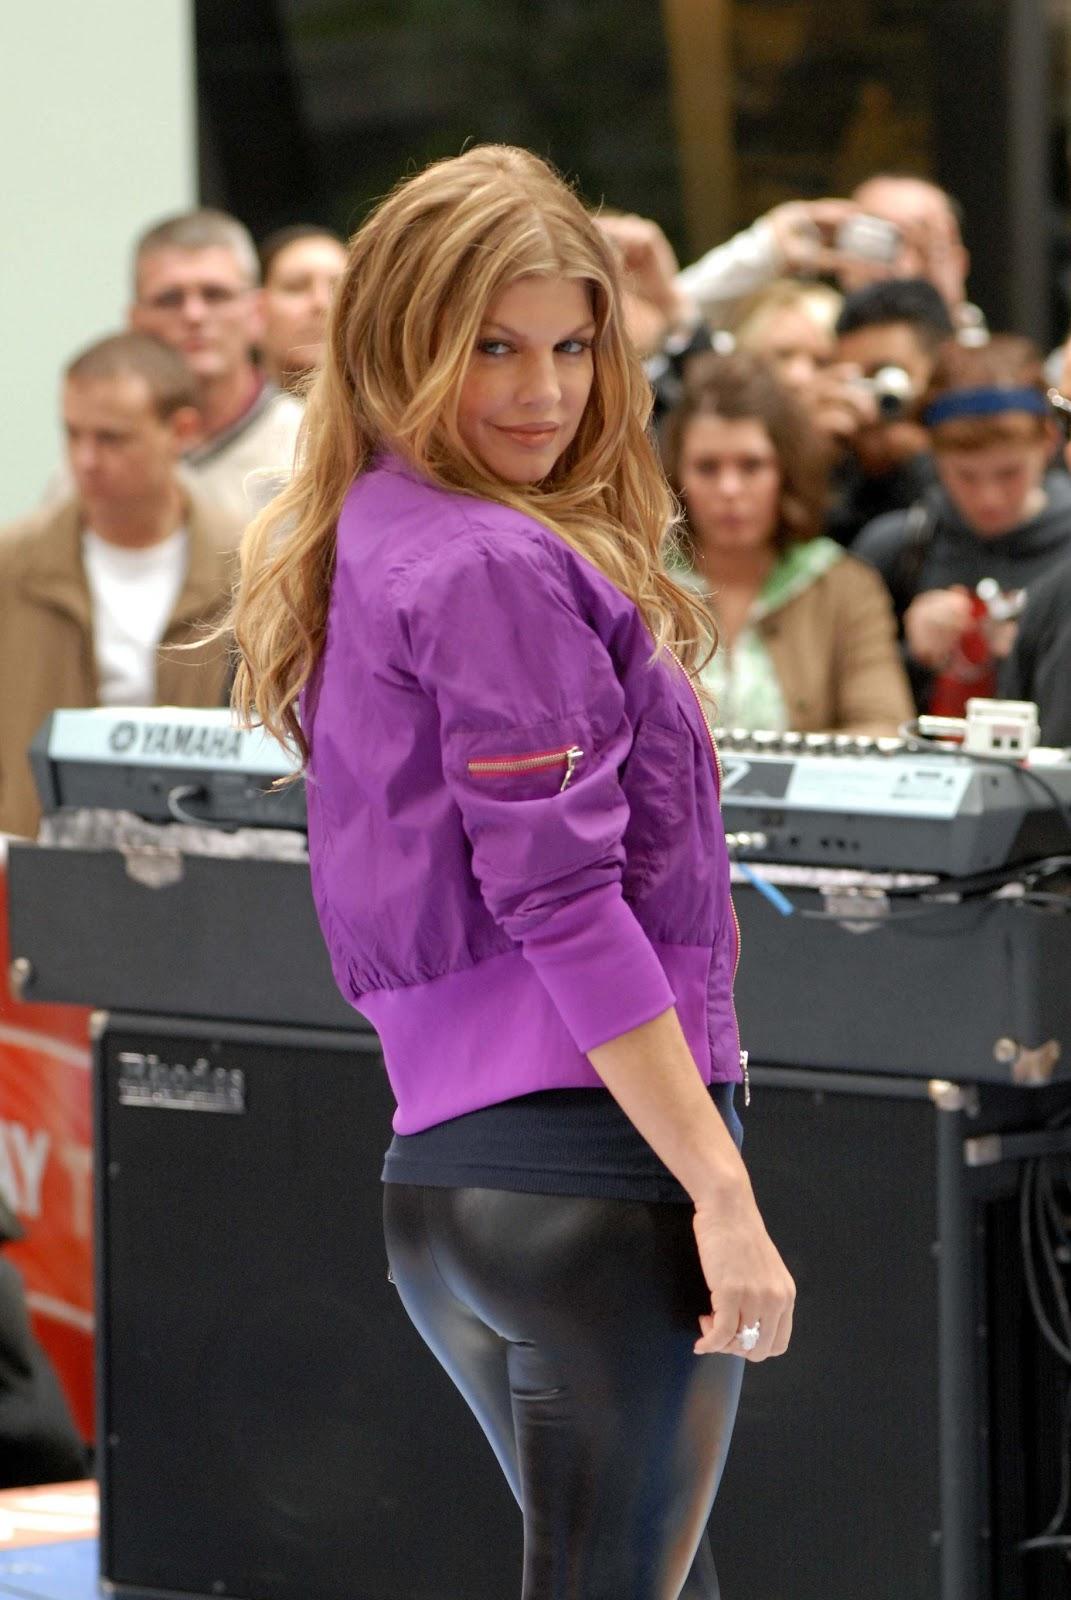 http://1.bp.blogspot.com/-ZDVEbJ_le-o/Tz4u9tu0ZQI/AAAAAAAAL5E/JsWtOlTFSq4/s1600/Fergie+15.jpg